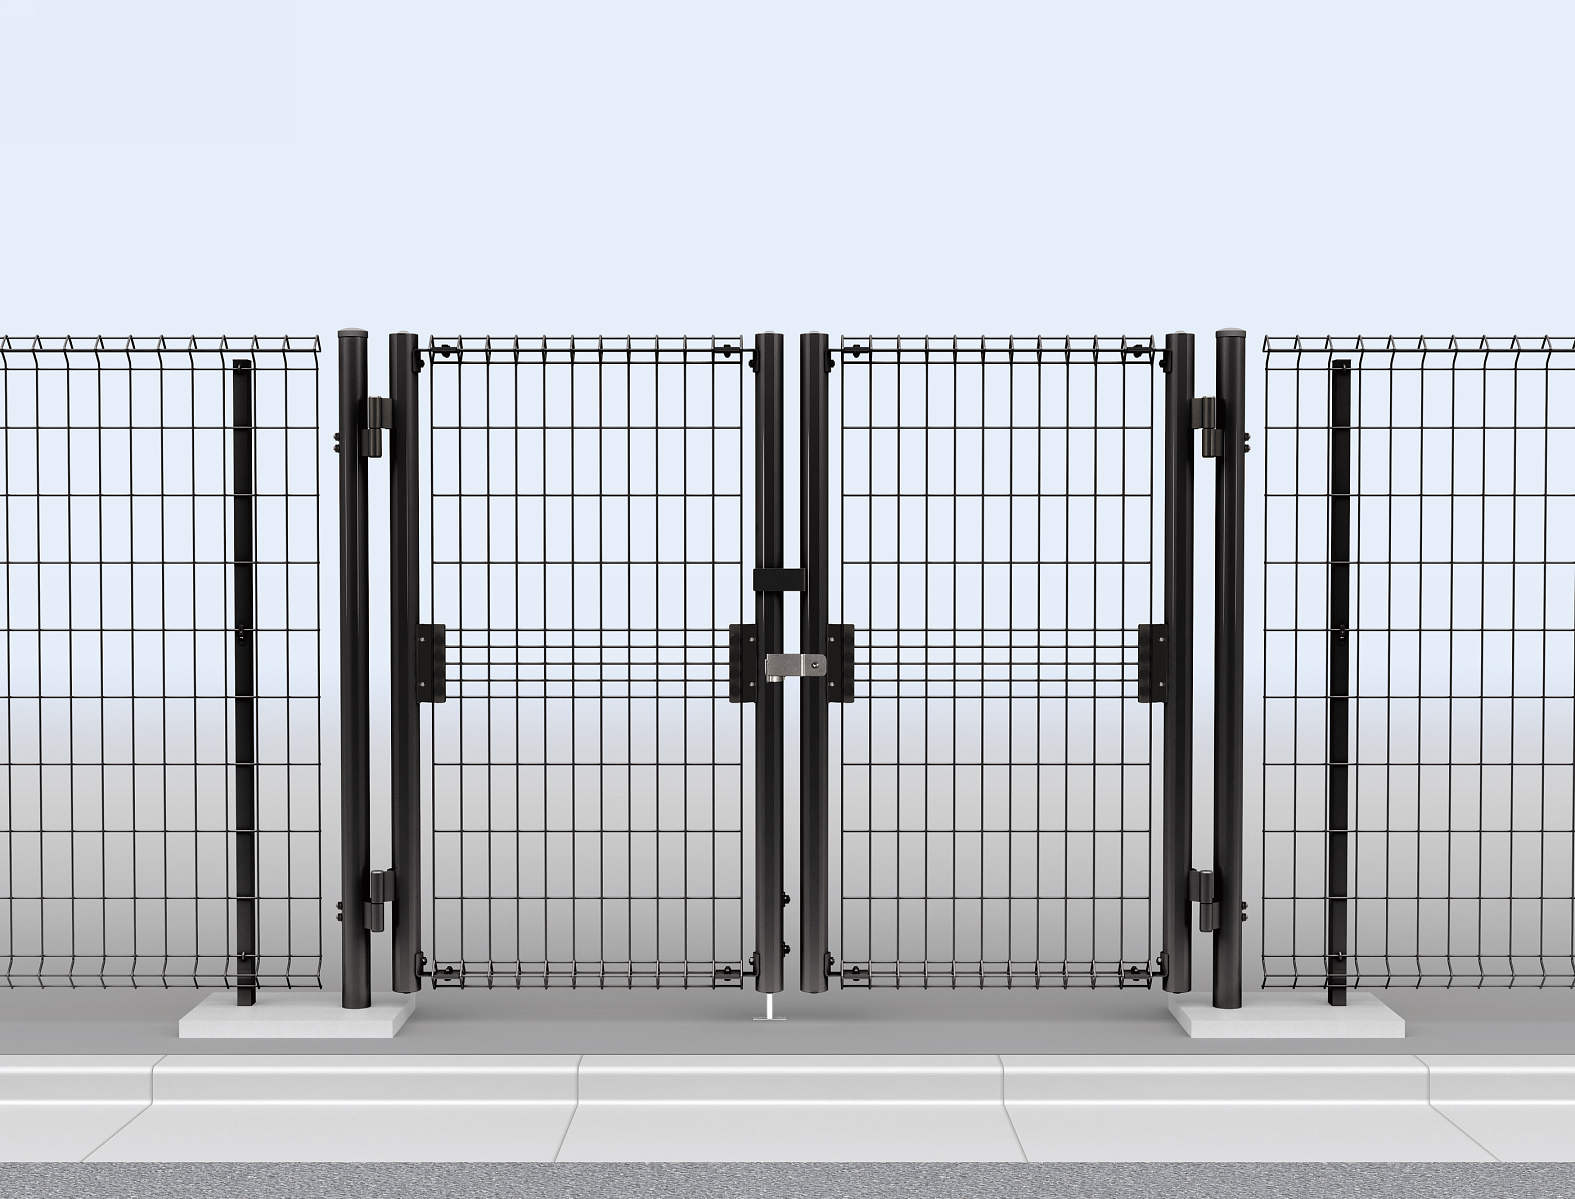 YKKAPガーデンエクステリア 門扉 イーネット 1型 両開き[門柱セット]:[幅1600mm×高1200mm]【YKK】【YKK門扉】【スチール門扉】【庭まわり】【出入口】【DIY】【間仕切り】【駐車場】